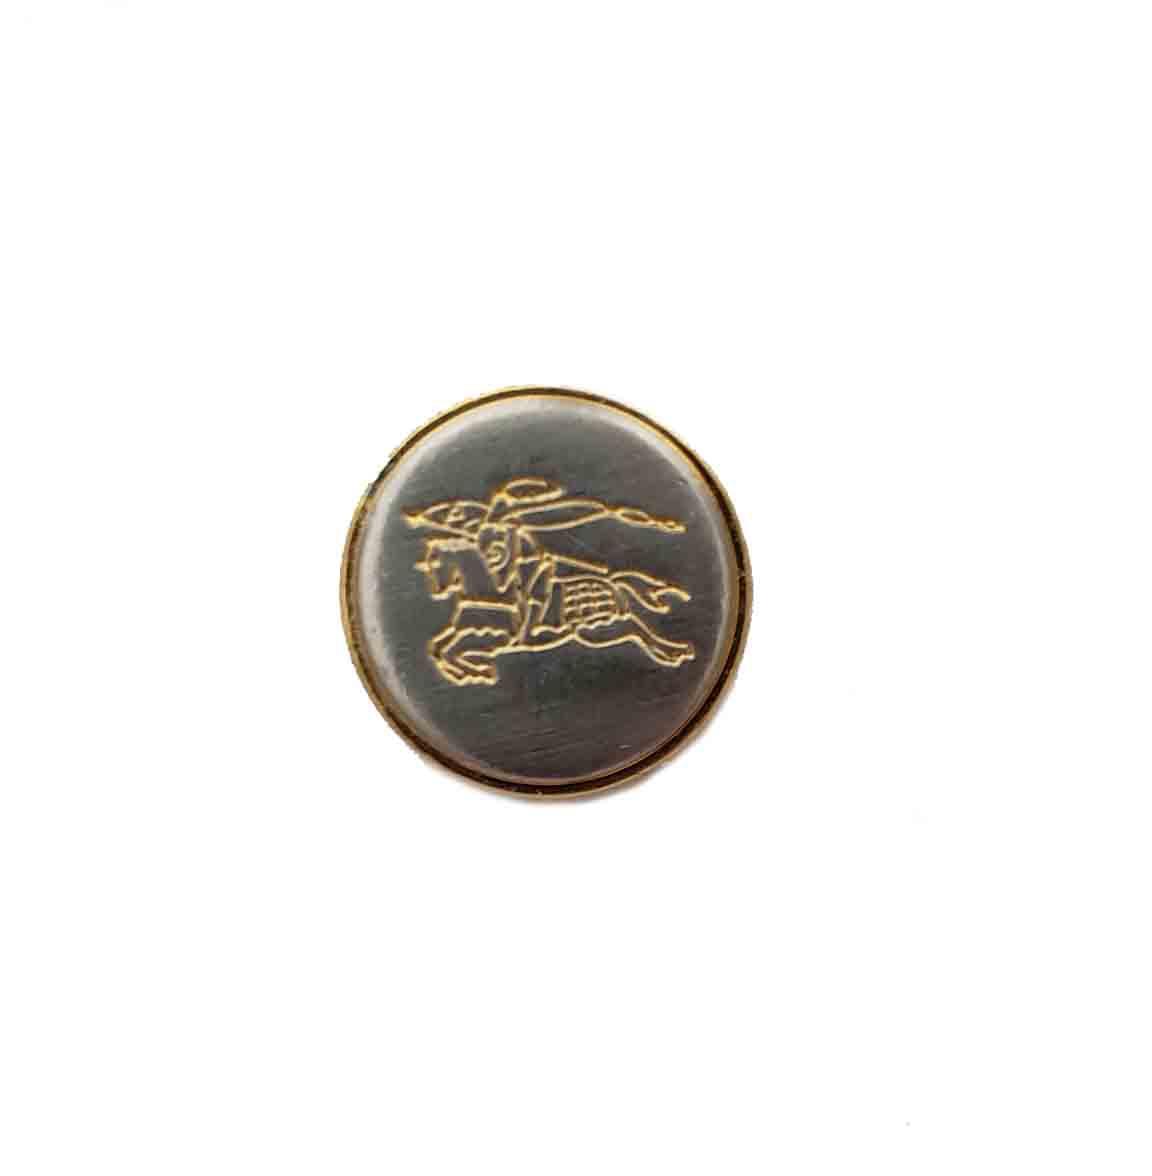 One Vintage Burberrys' Blazer Sleeve Button Silver Gold Metal Knightsman Pattern Men's